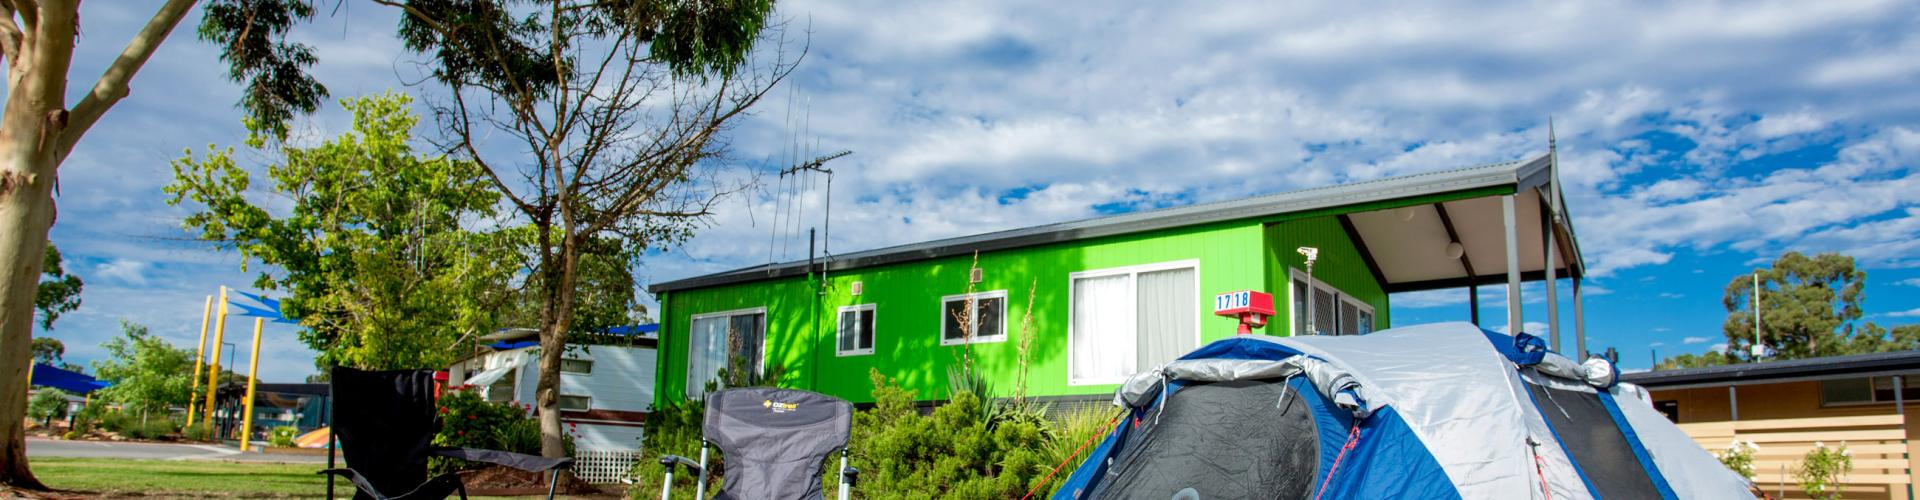 BIG4 Bendigo Park Lane Holiday Park - Unpowered Site